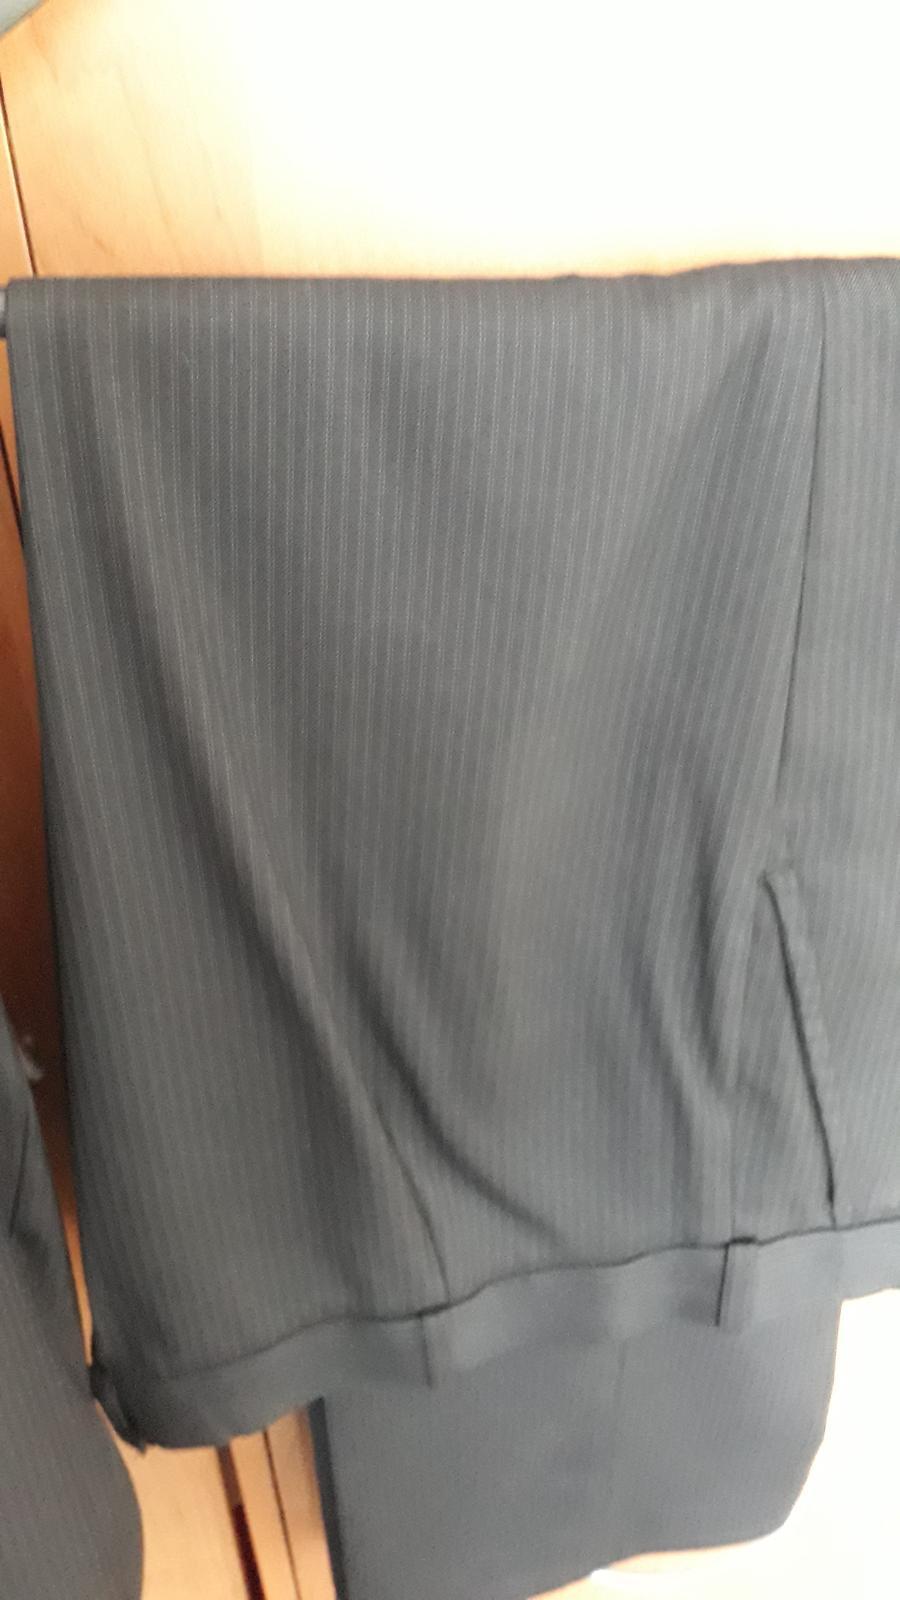 Svadobný oblek - Obrázok č. 2